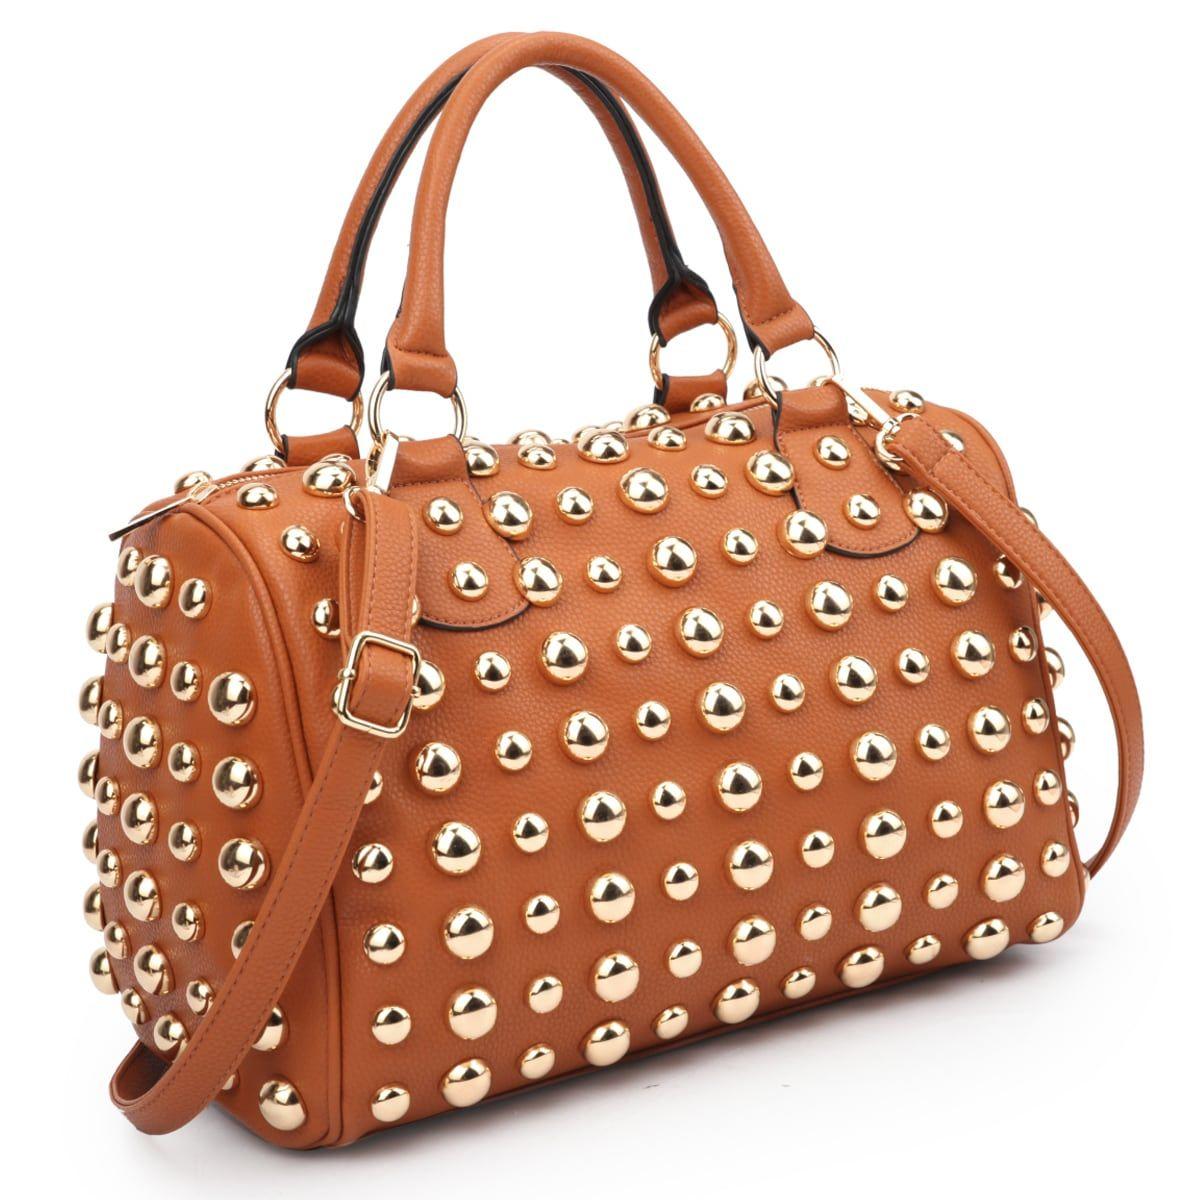 d5416fc4b2f6 Dasein Bling Studded Barrel Body Satchel Bag (Brown)